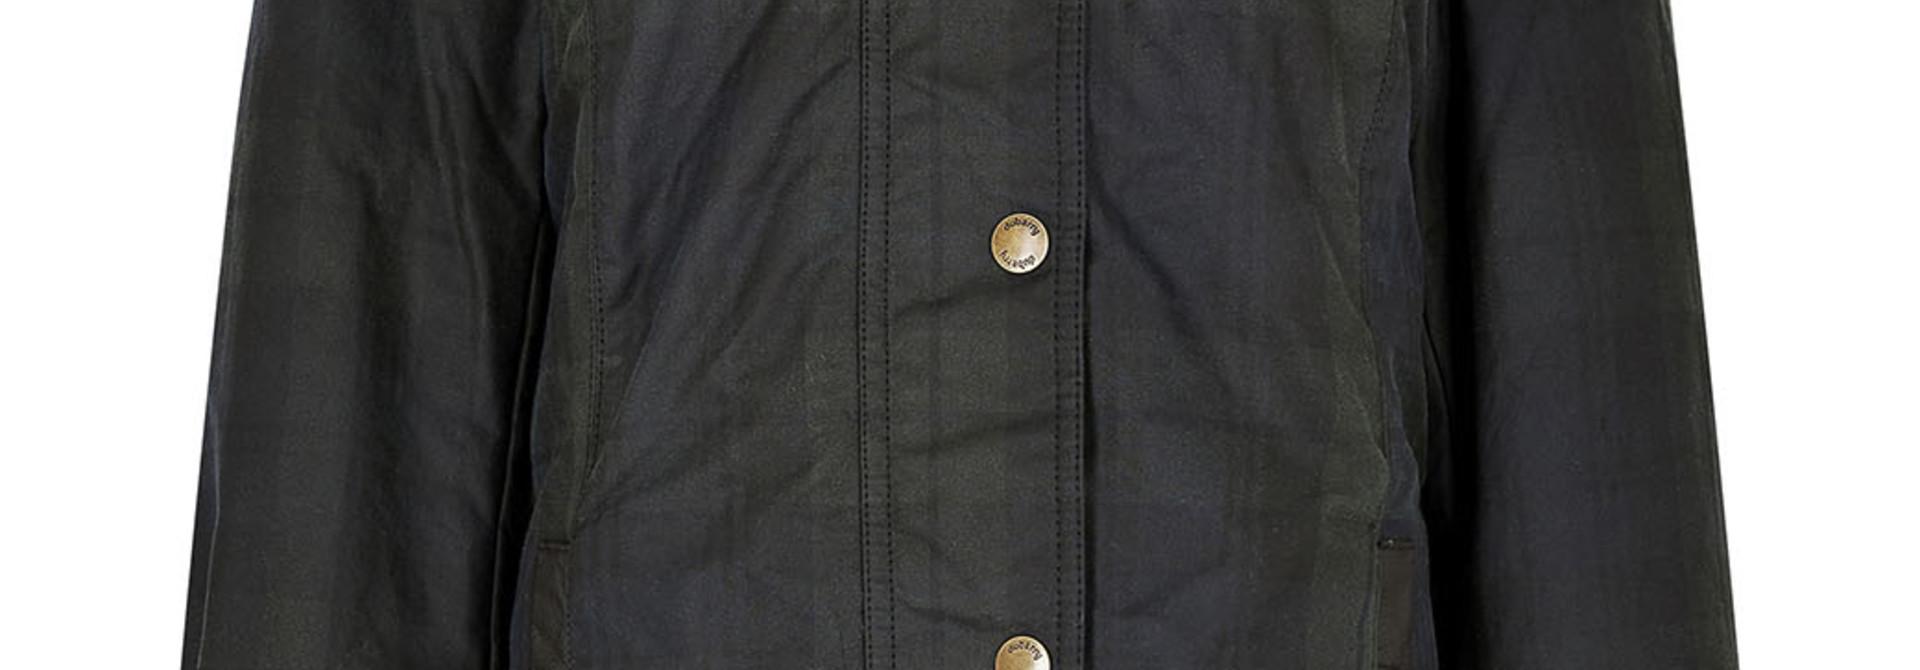 Dubarry Annestown PrimaLoft® Waxjas - Black Watch